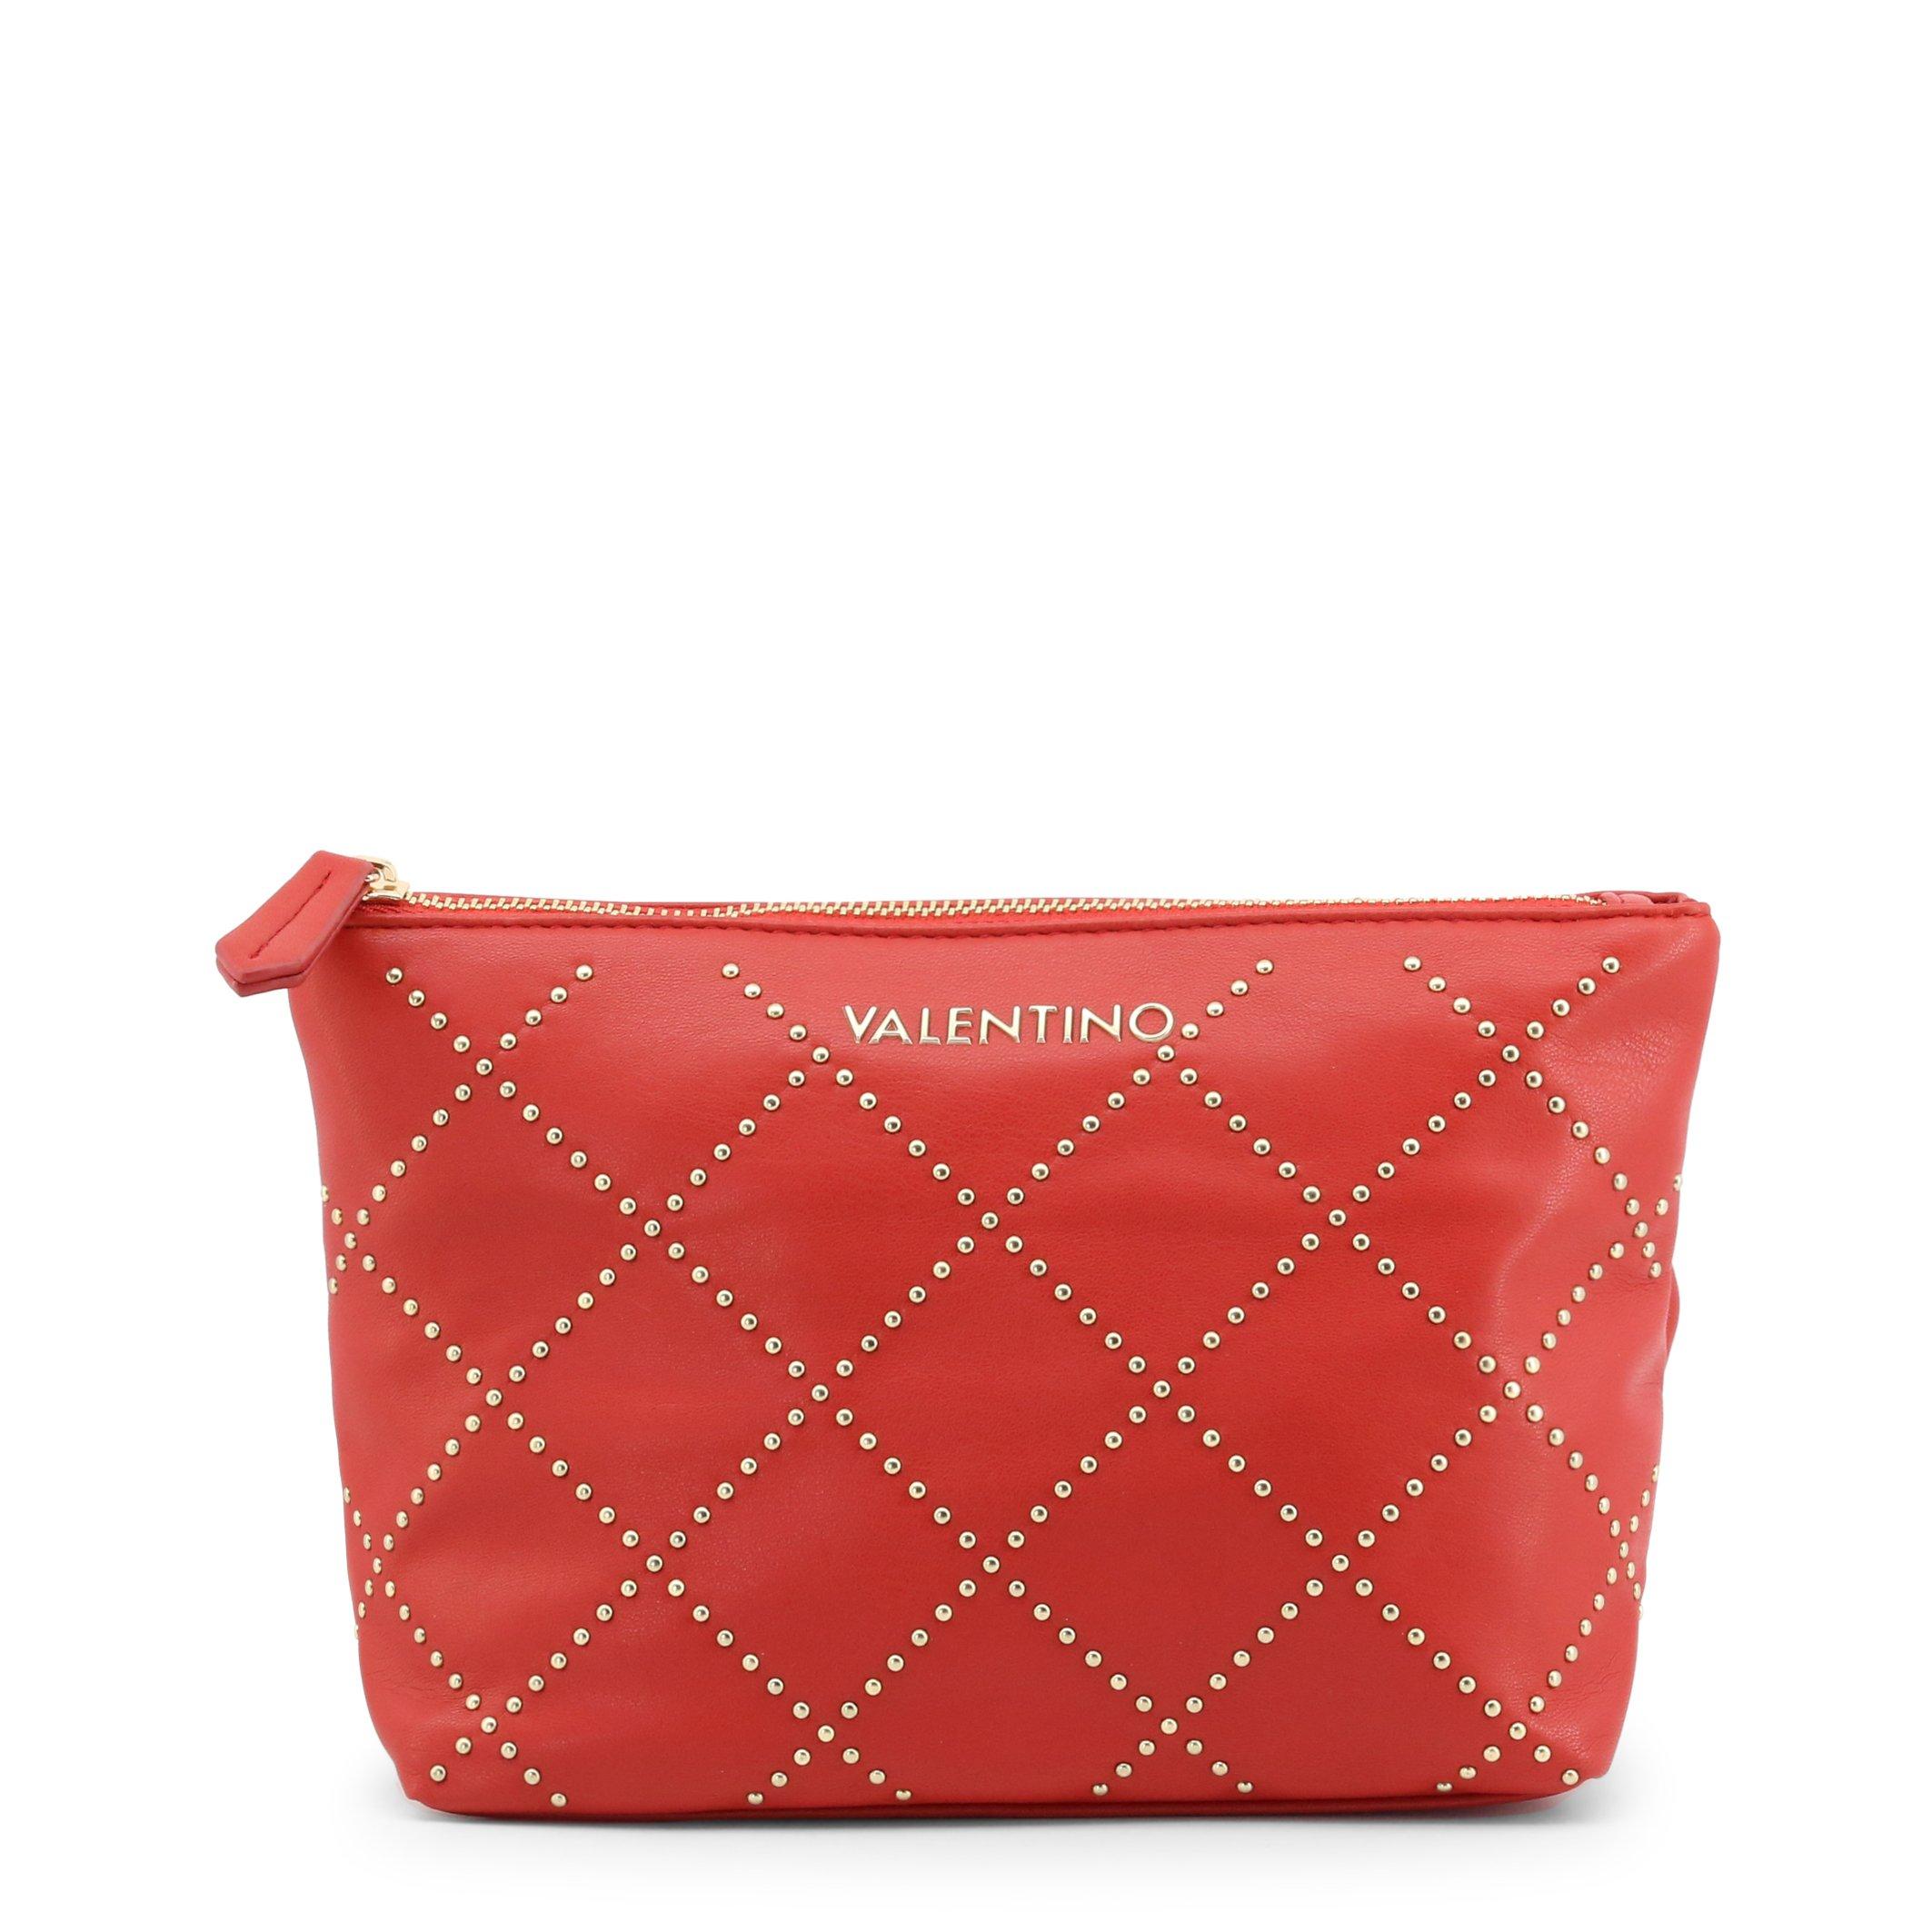 Valentino by Mario Valentino Women's Clutch Bag Various Colours MANDOLINO-VBE3KI513 - red NOSIZE